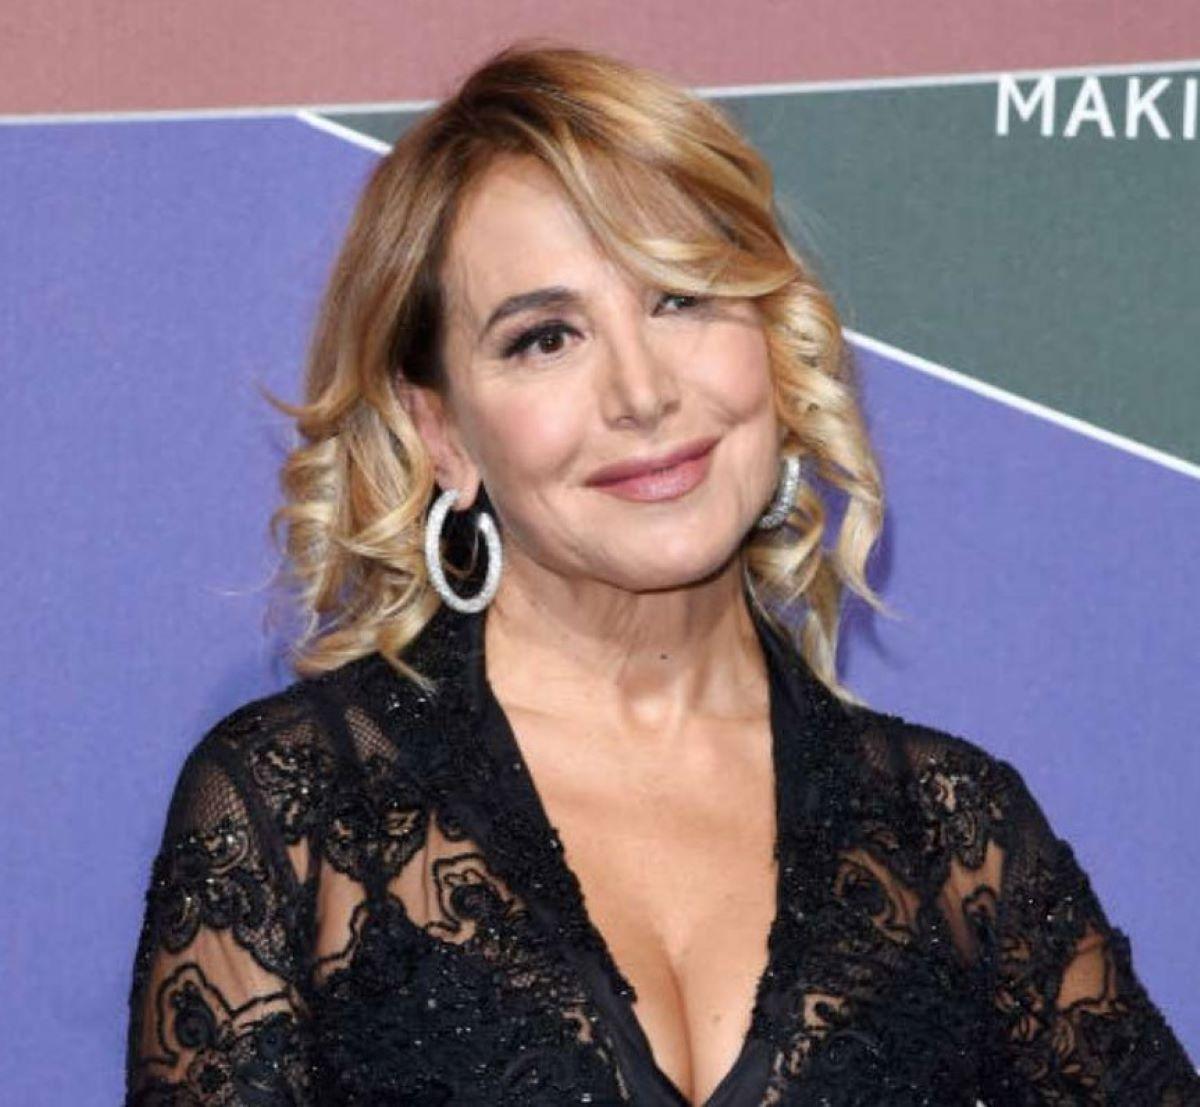 Barbara D'Urso Lavoro Studi Mediaset Pomeriggio Cinque